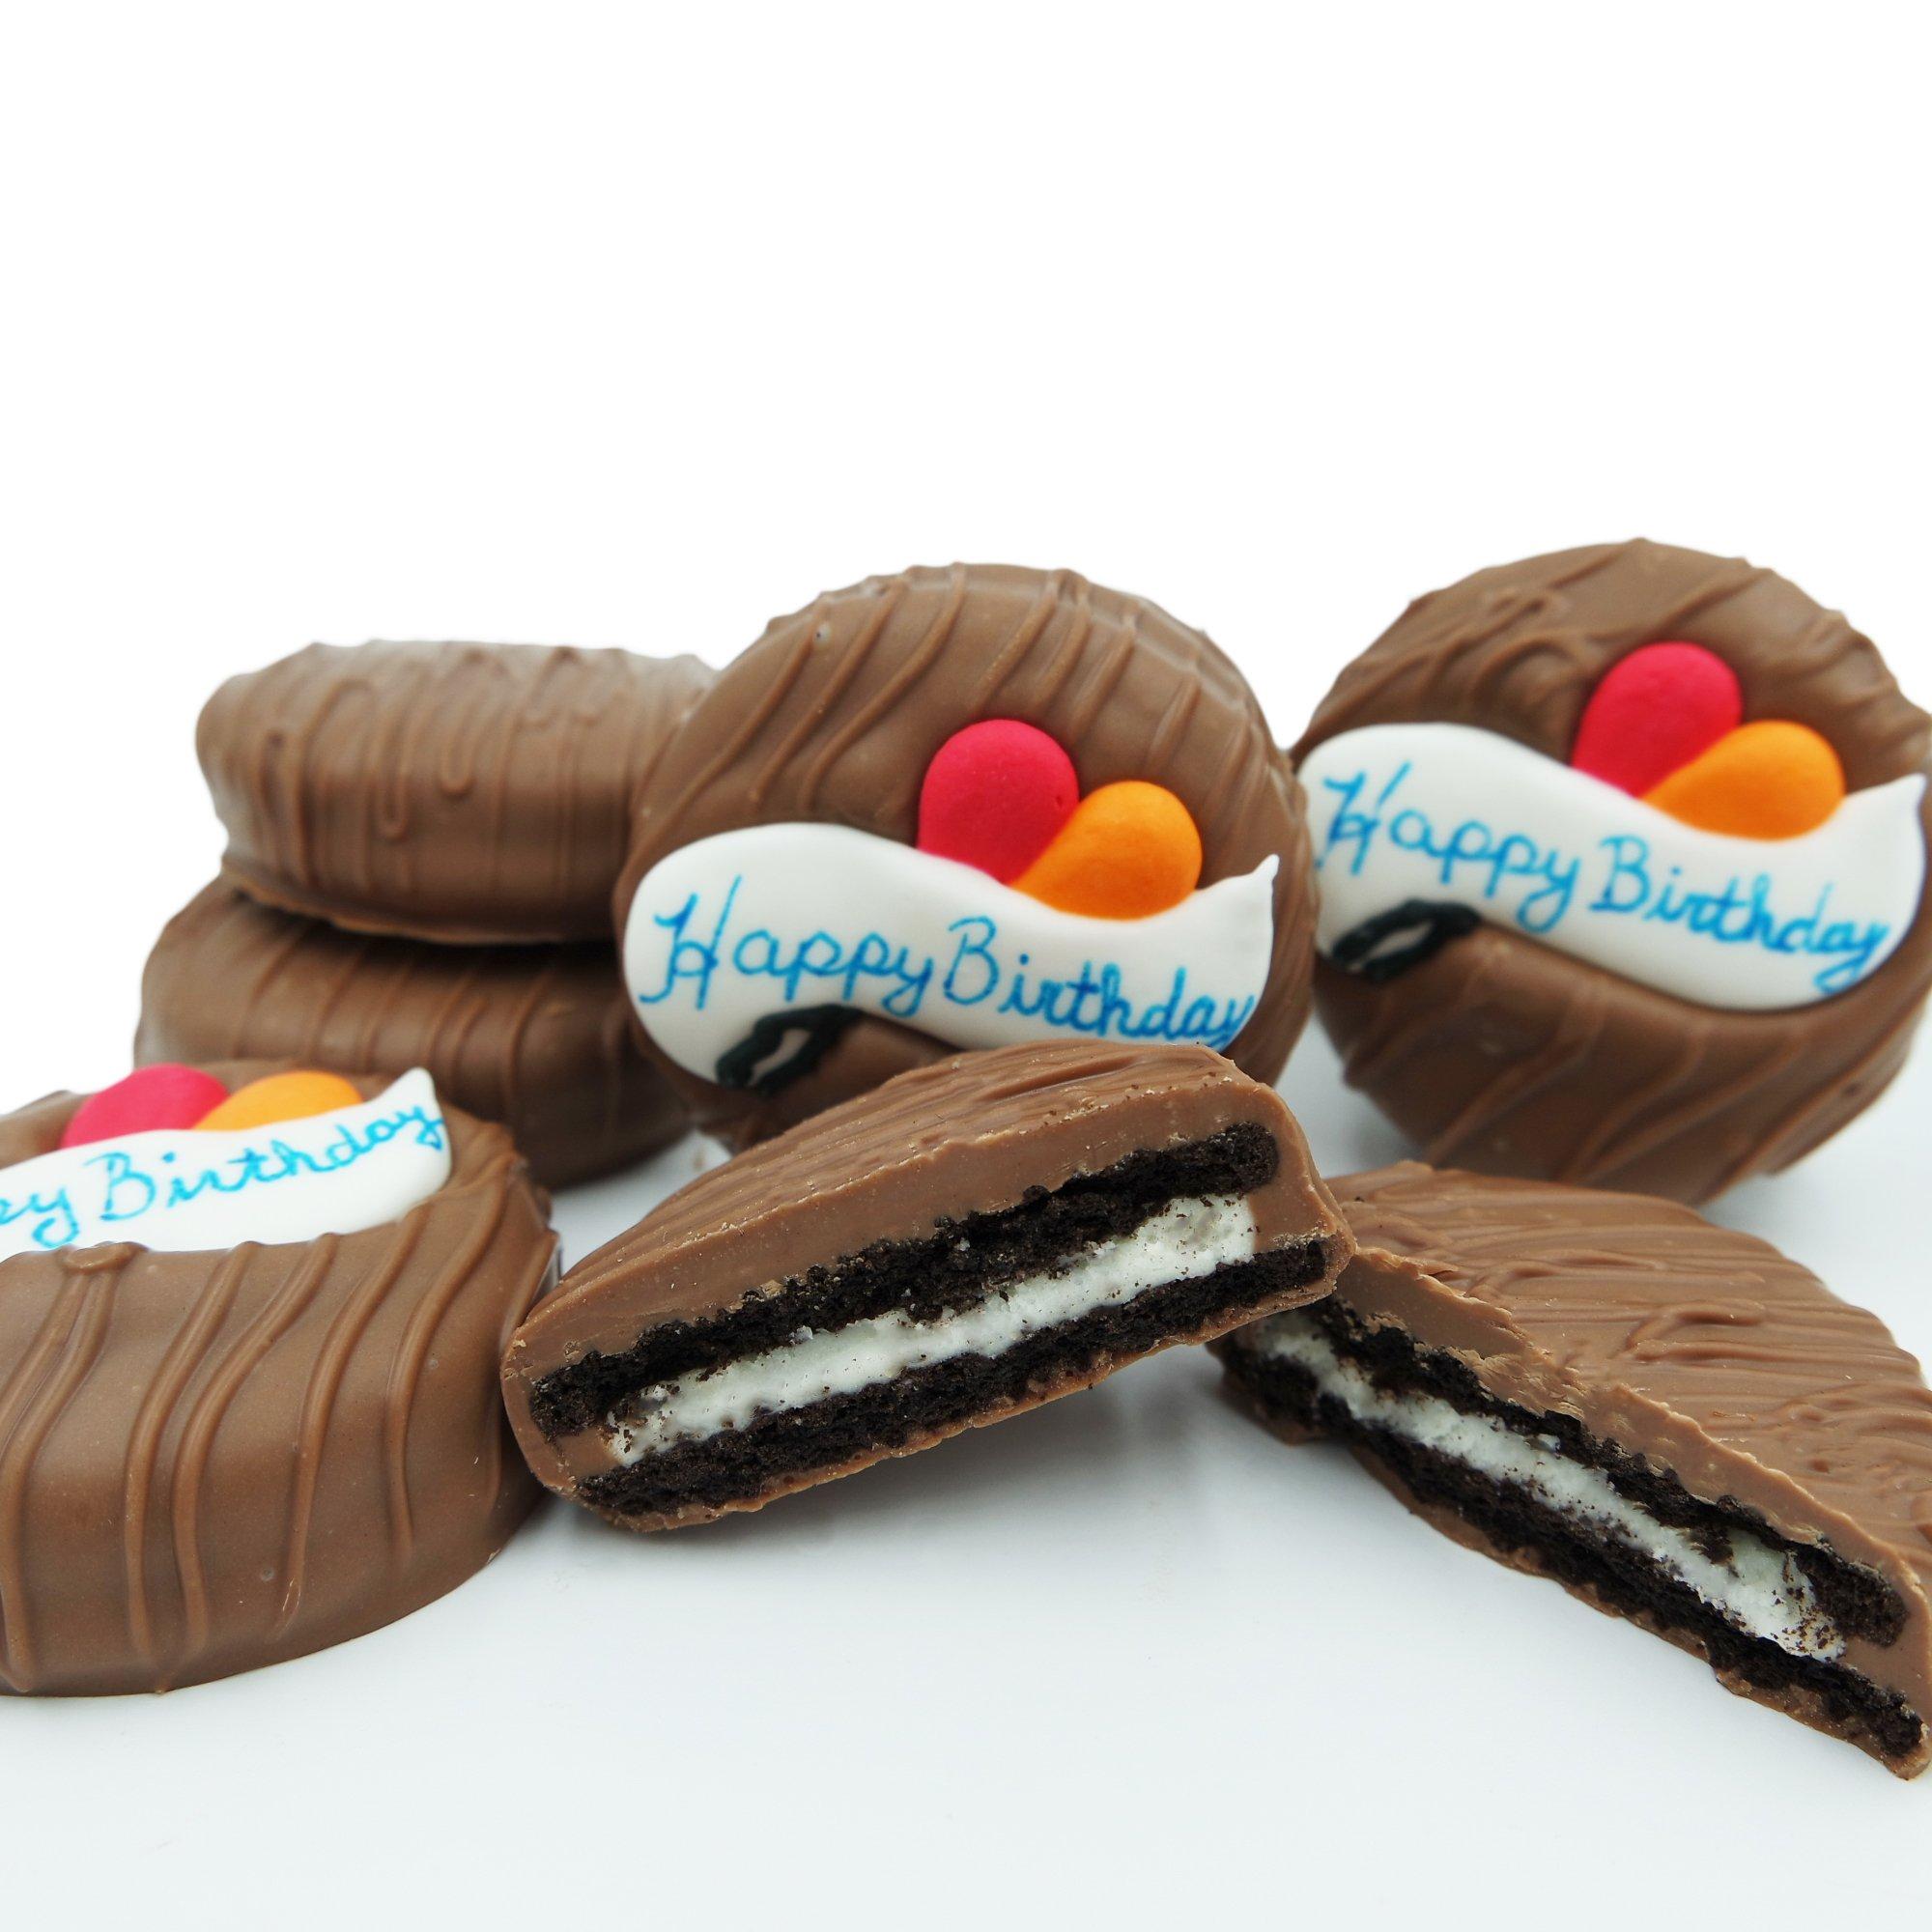 Philadelphia Candies Milk Chocolate Covered OREO Cookies, Happy Birthday Gift 8 Ounce